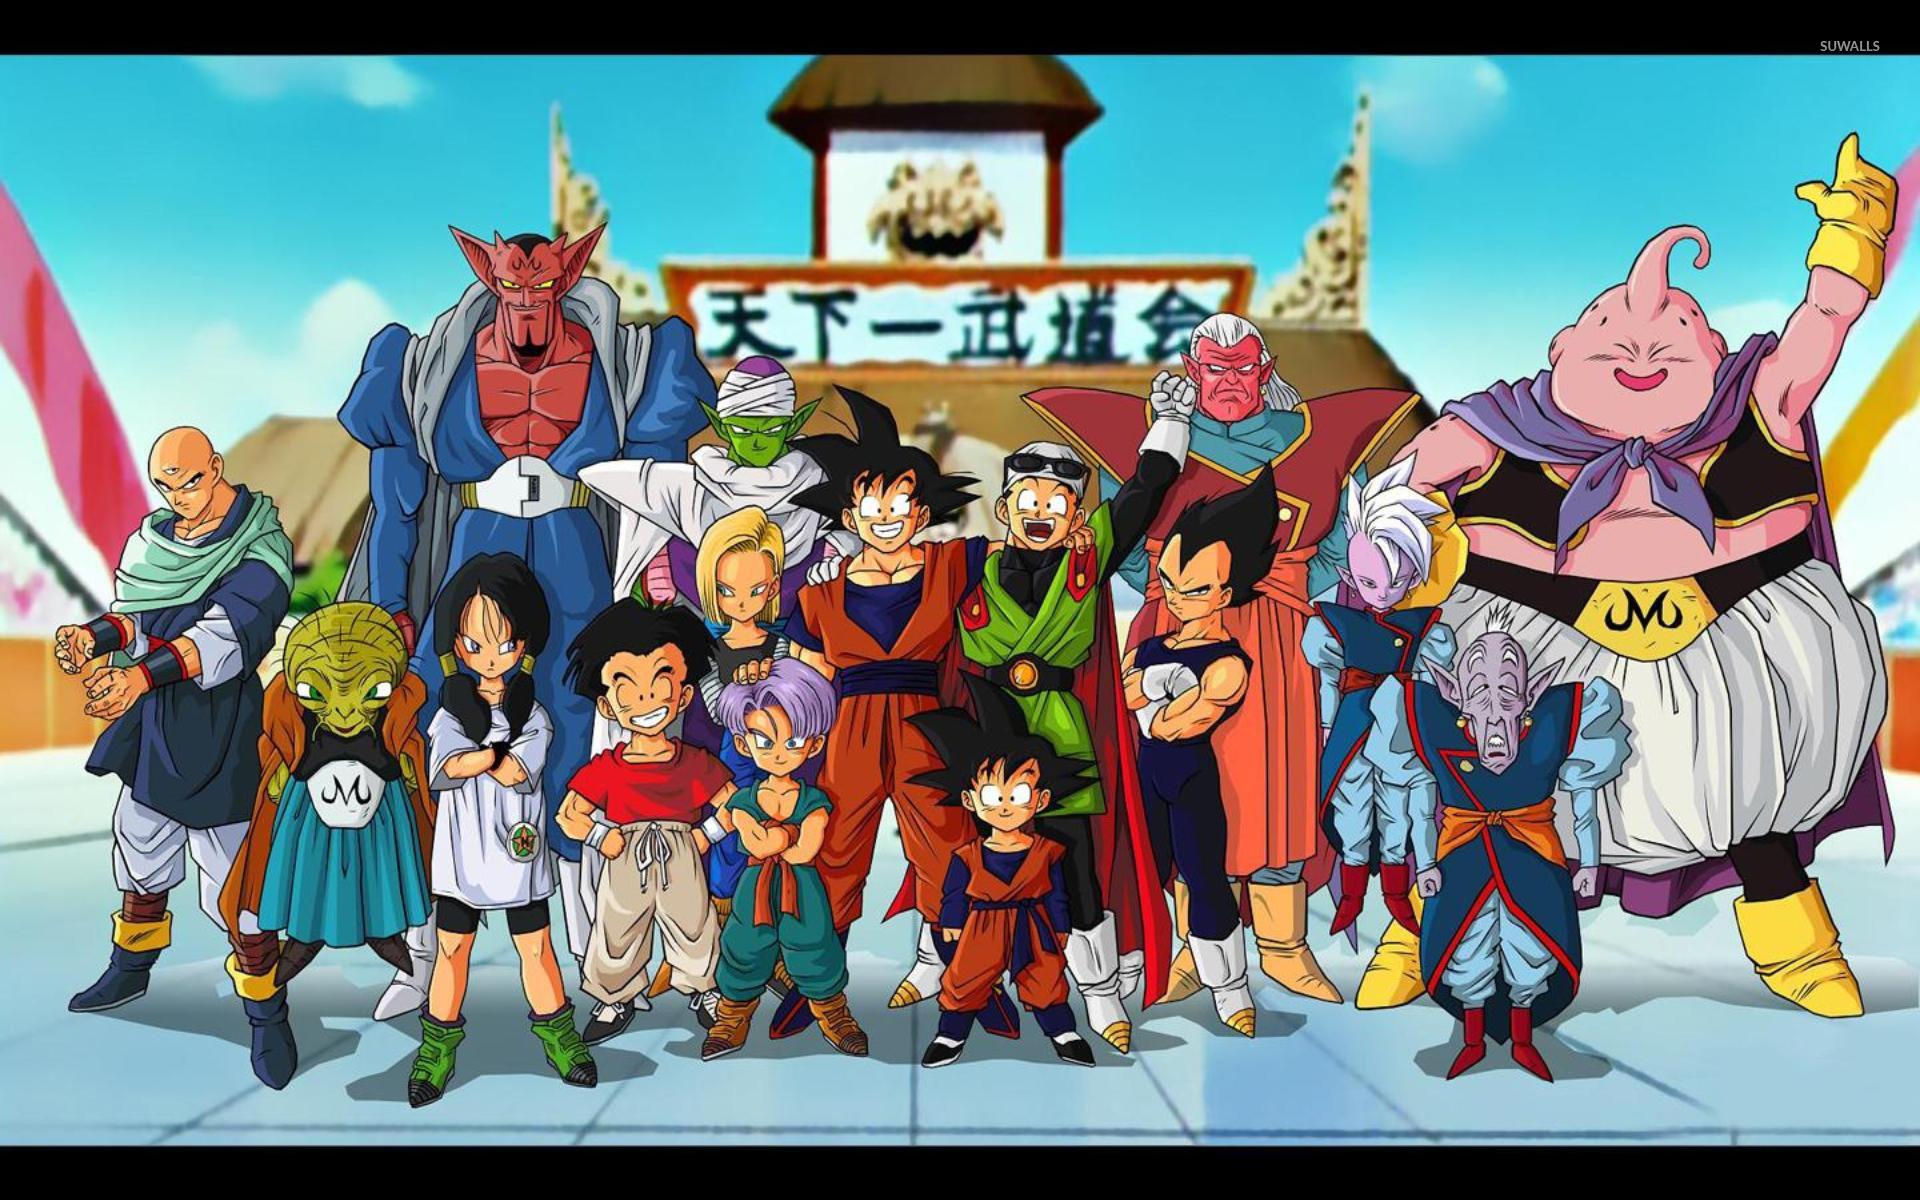 Dragon Ball Z 5 Wallpaper Anime Wallpapers 12486